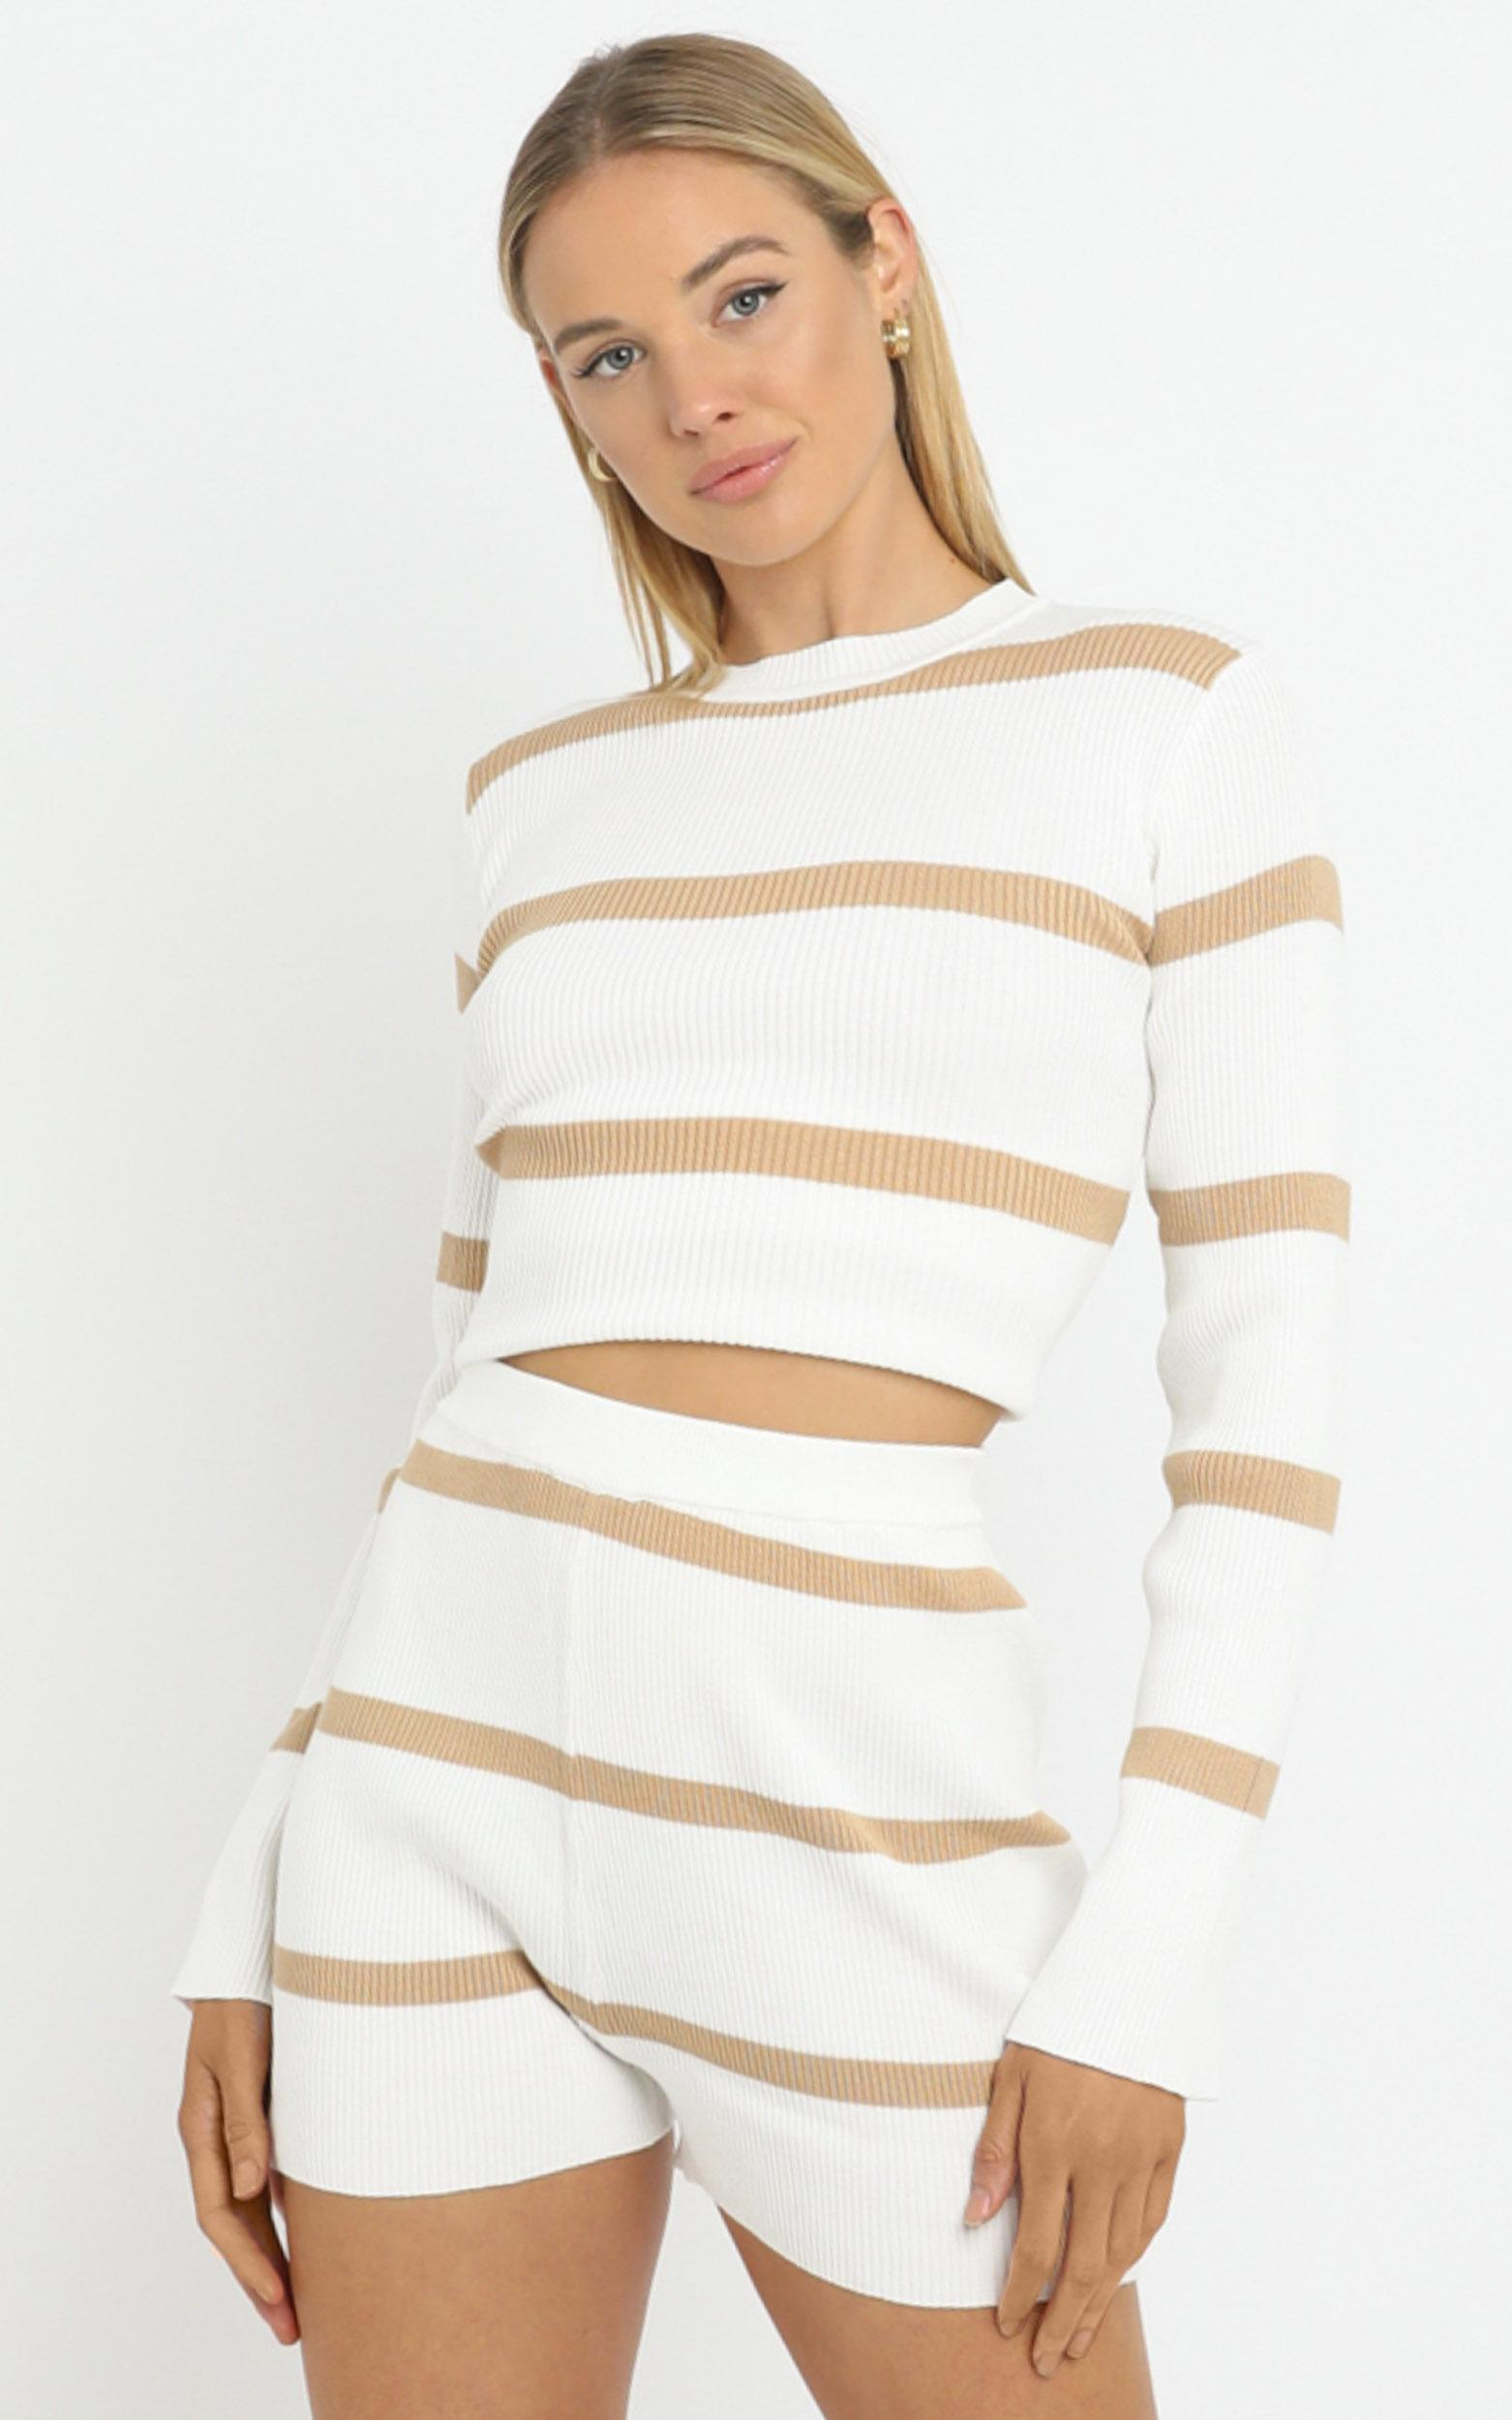 Jennings Knit Two Piece Set Beige Stripe - L/XL, White, hi-res image number null